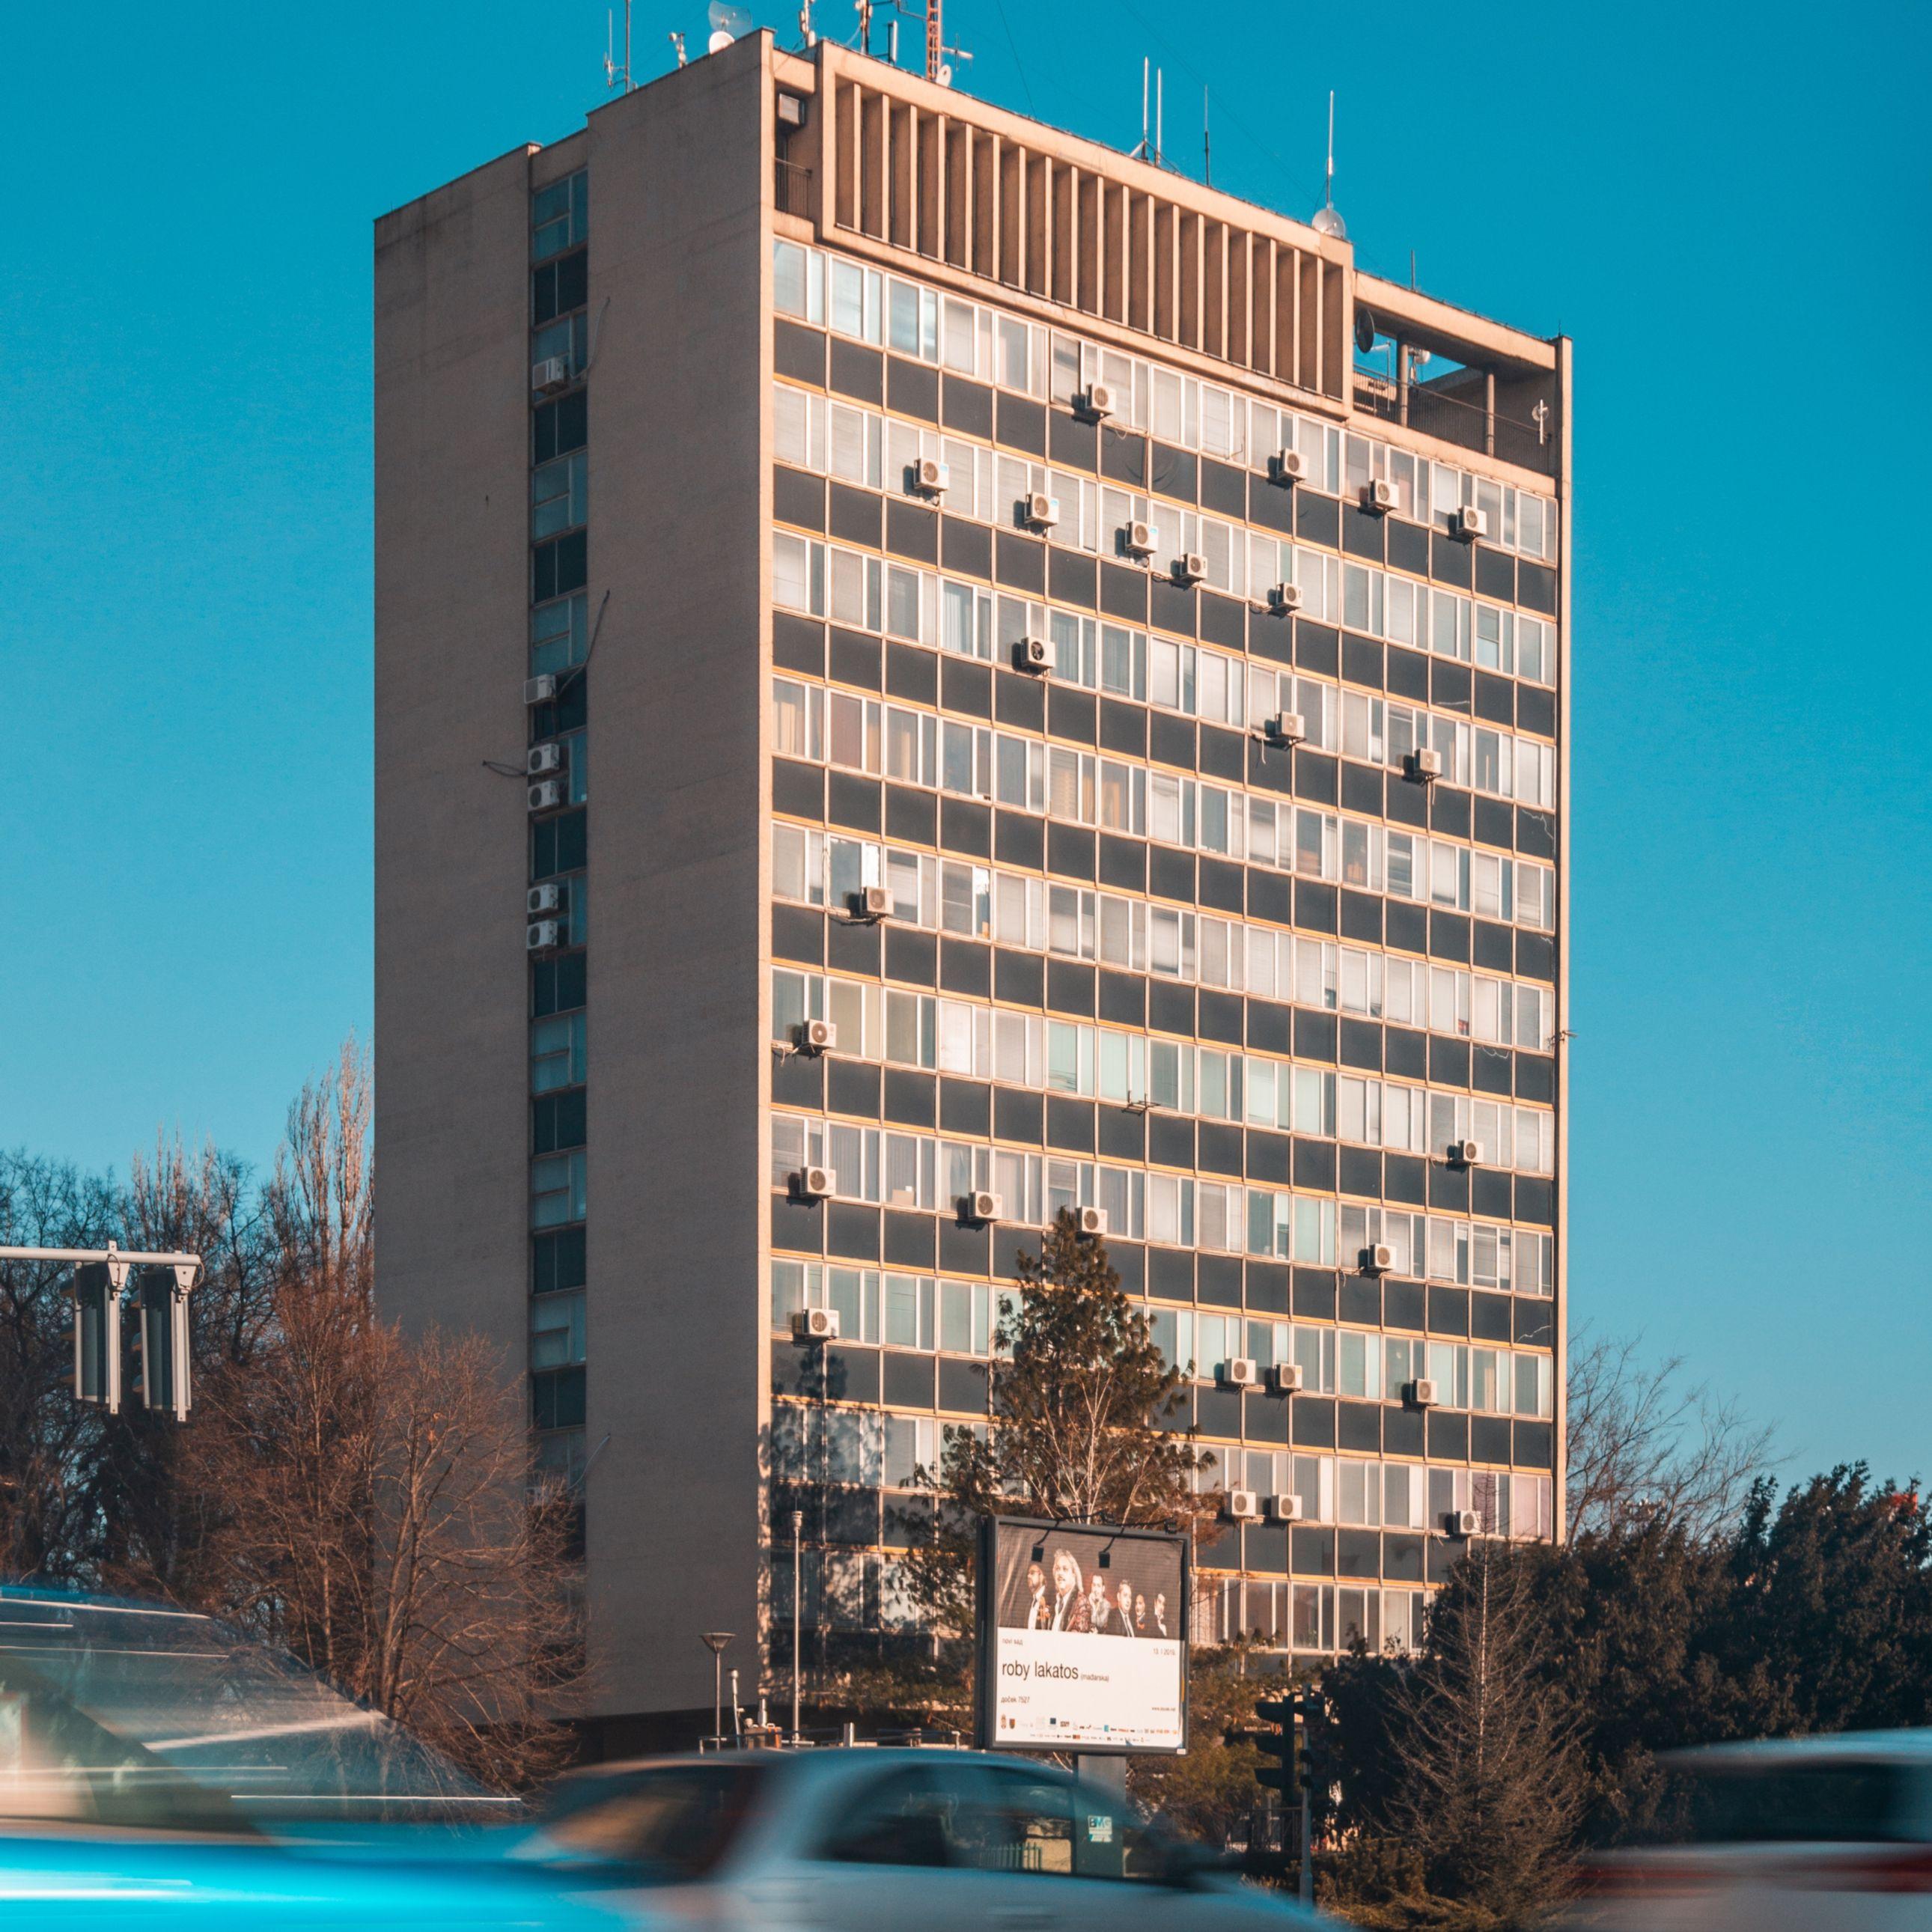 apartment building - Classes in Real Estate Investing